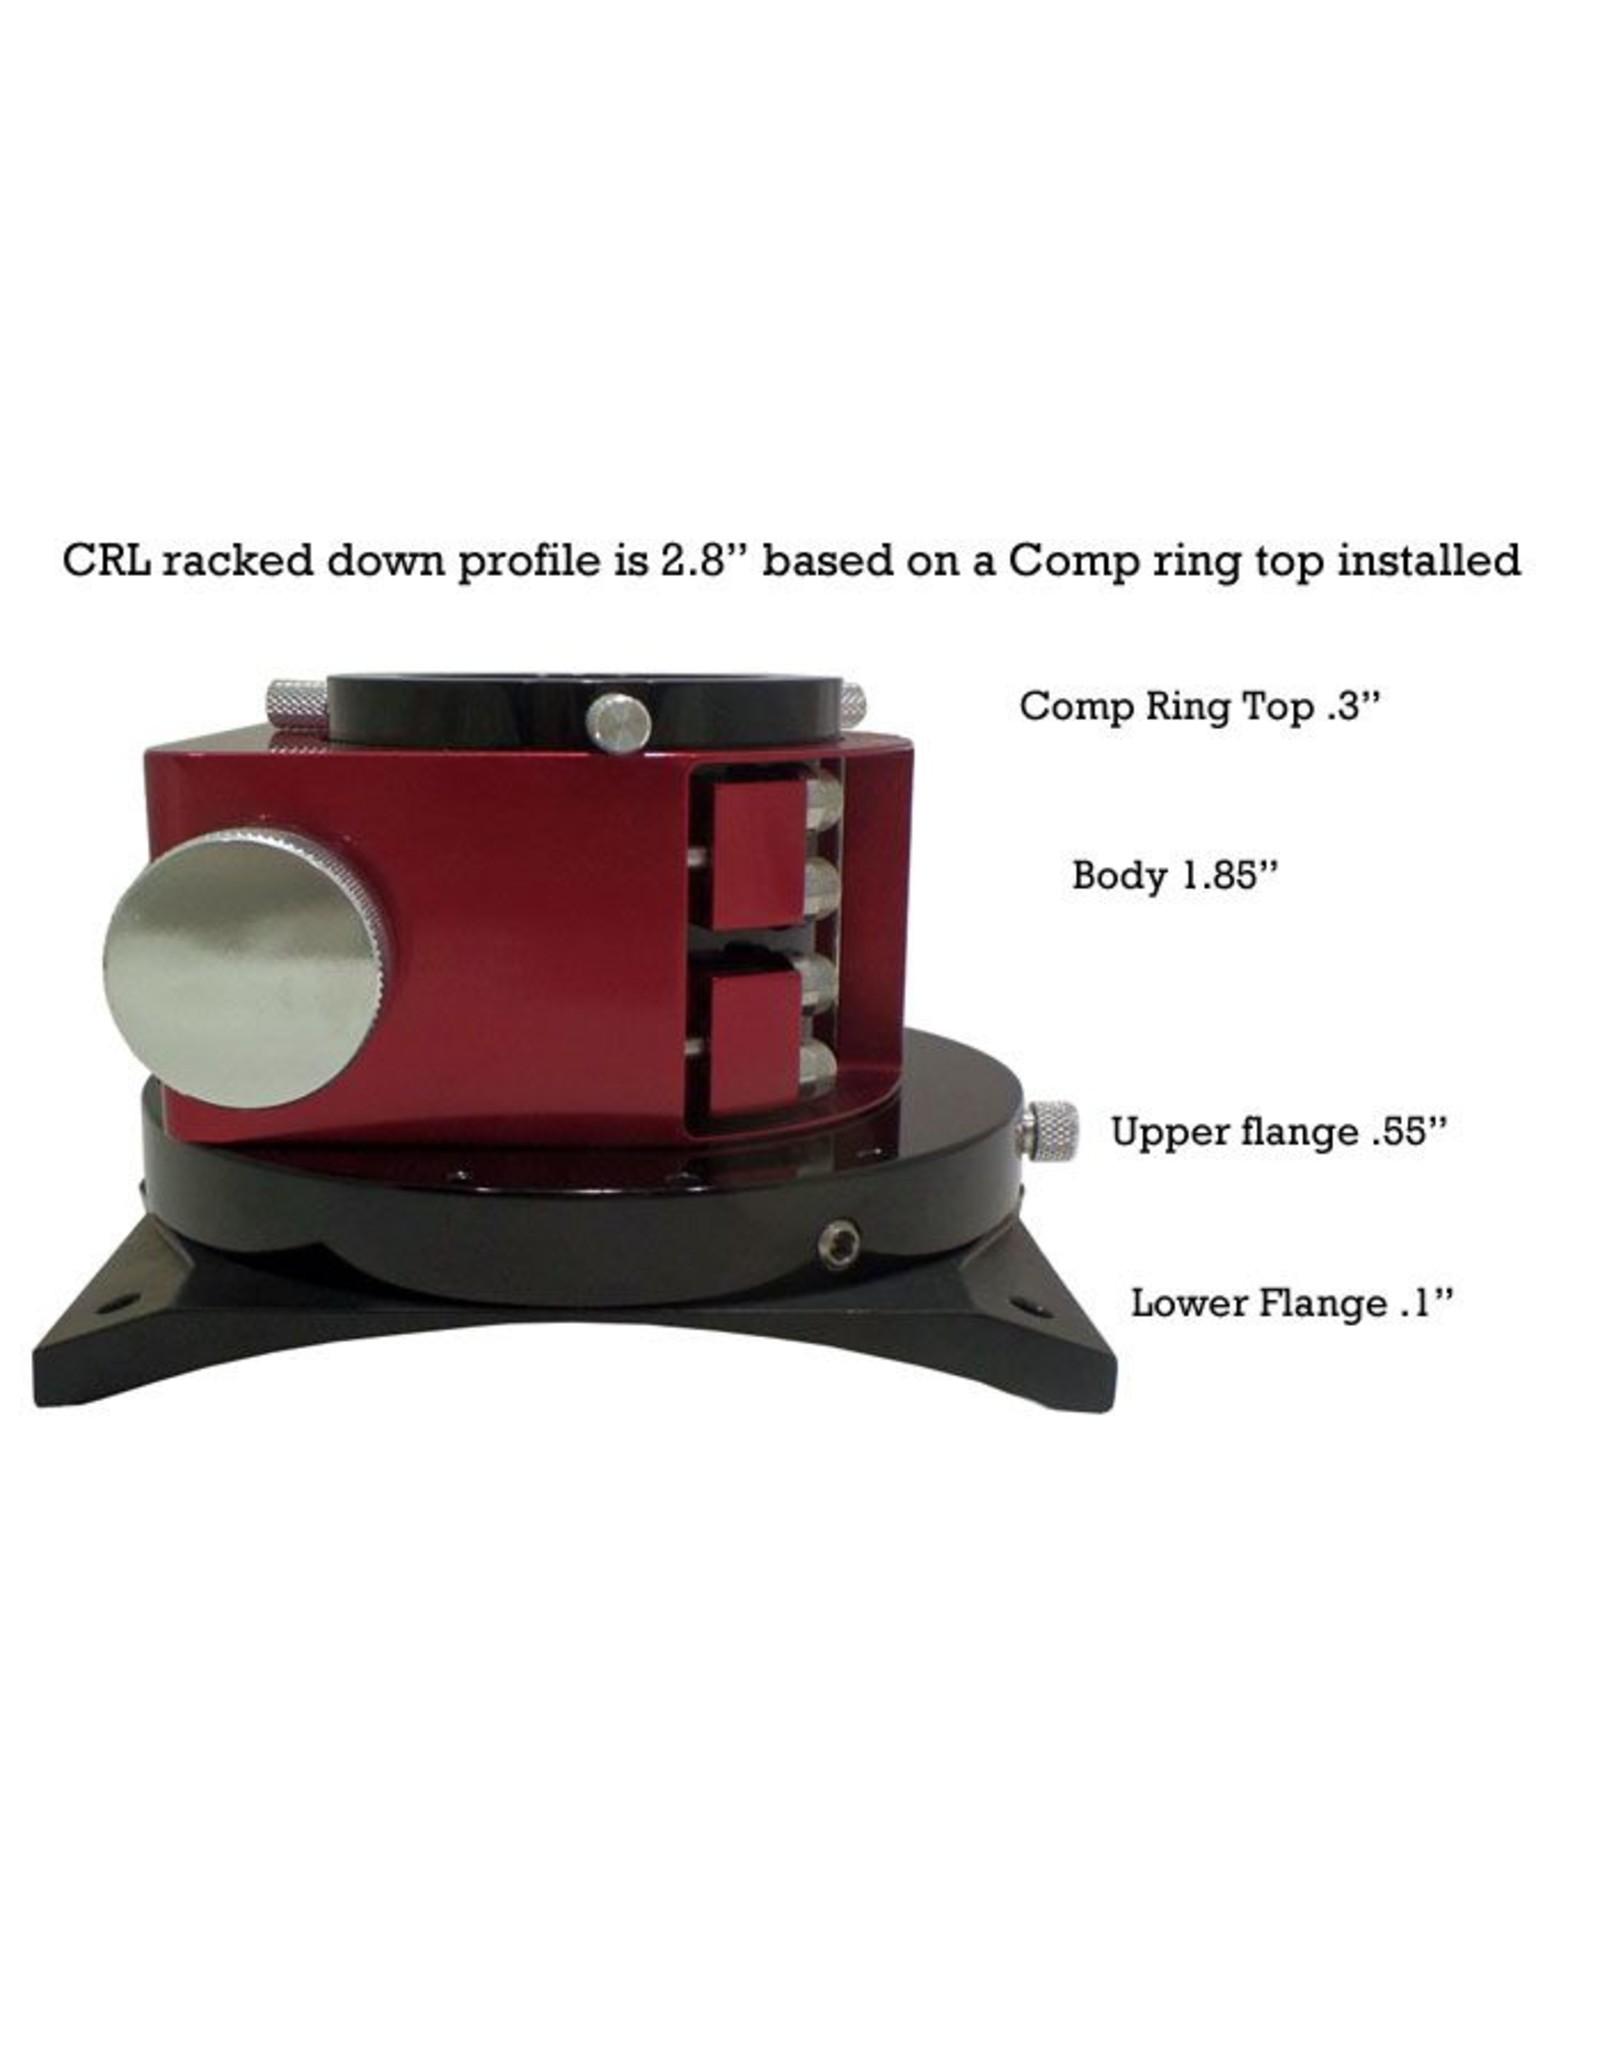 Moonlite MoonLite CRL 2.5 inch Large Format Crayford Newtonian Focusers (Specify Drawtube, Flange, & Color)